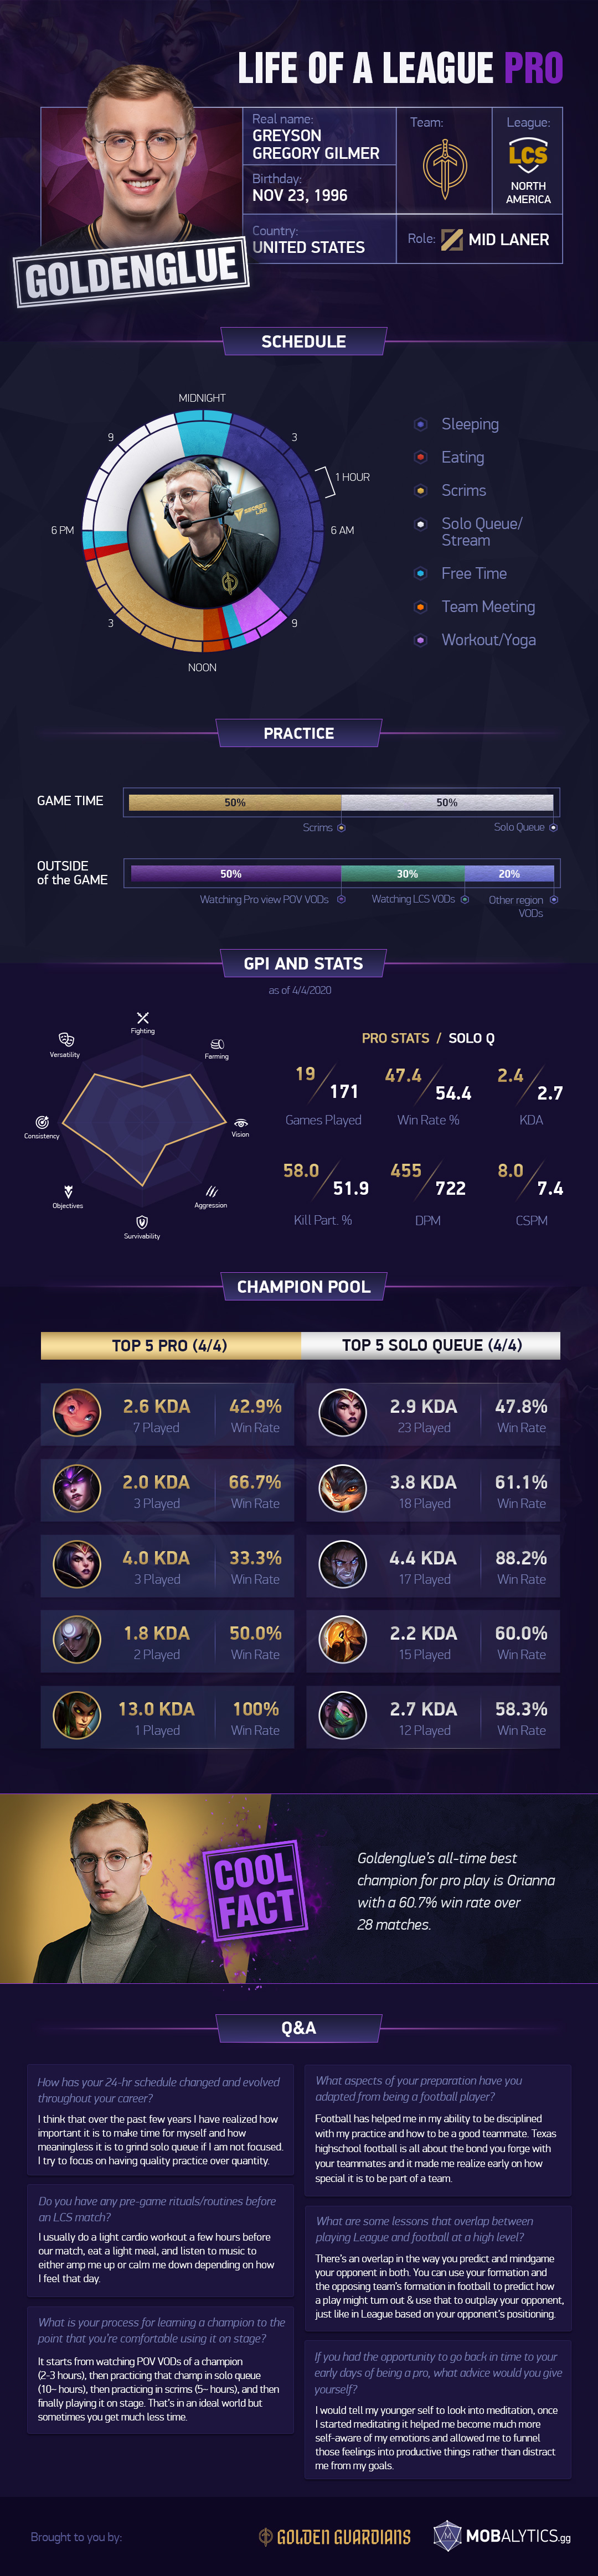 Goldenglue 24 hour infographic